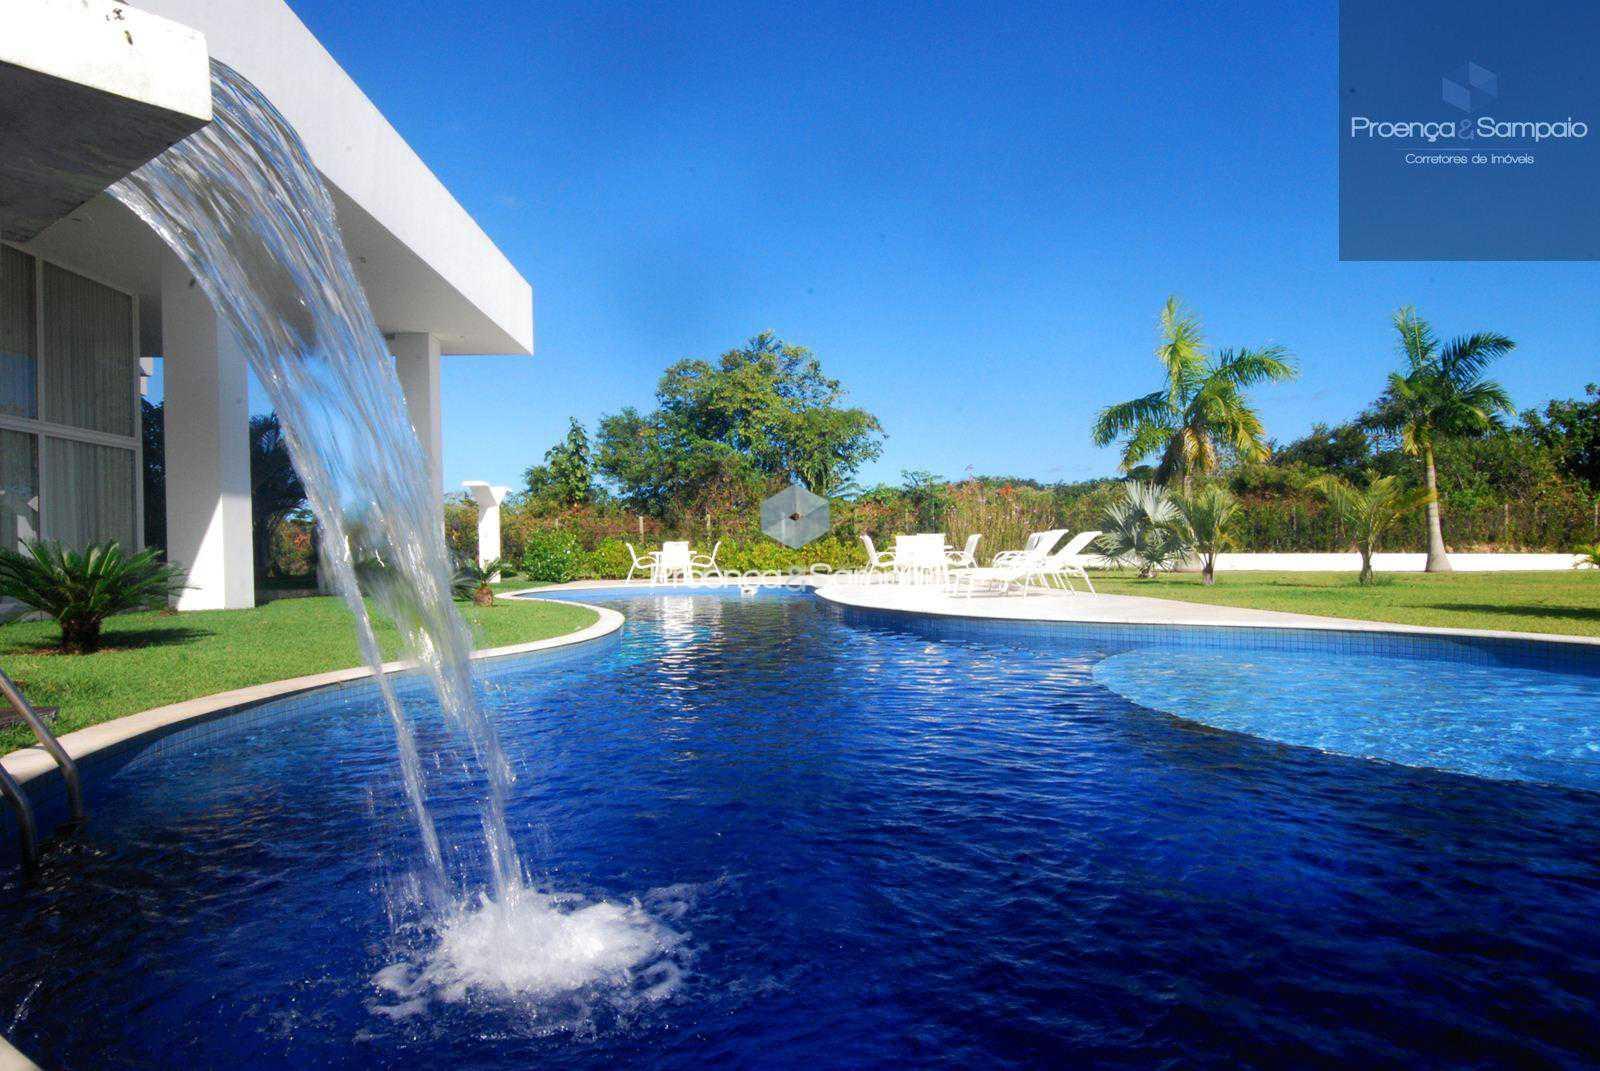 FOTO0 - Casa em Condomínio à venda Avenida Santos Dumont,Lauro de Freitas,BA - R$ 7.000.000 - PSCN50005 - 1